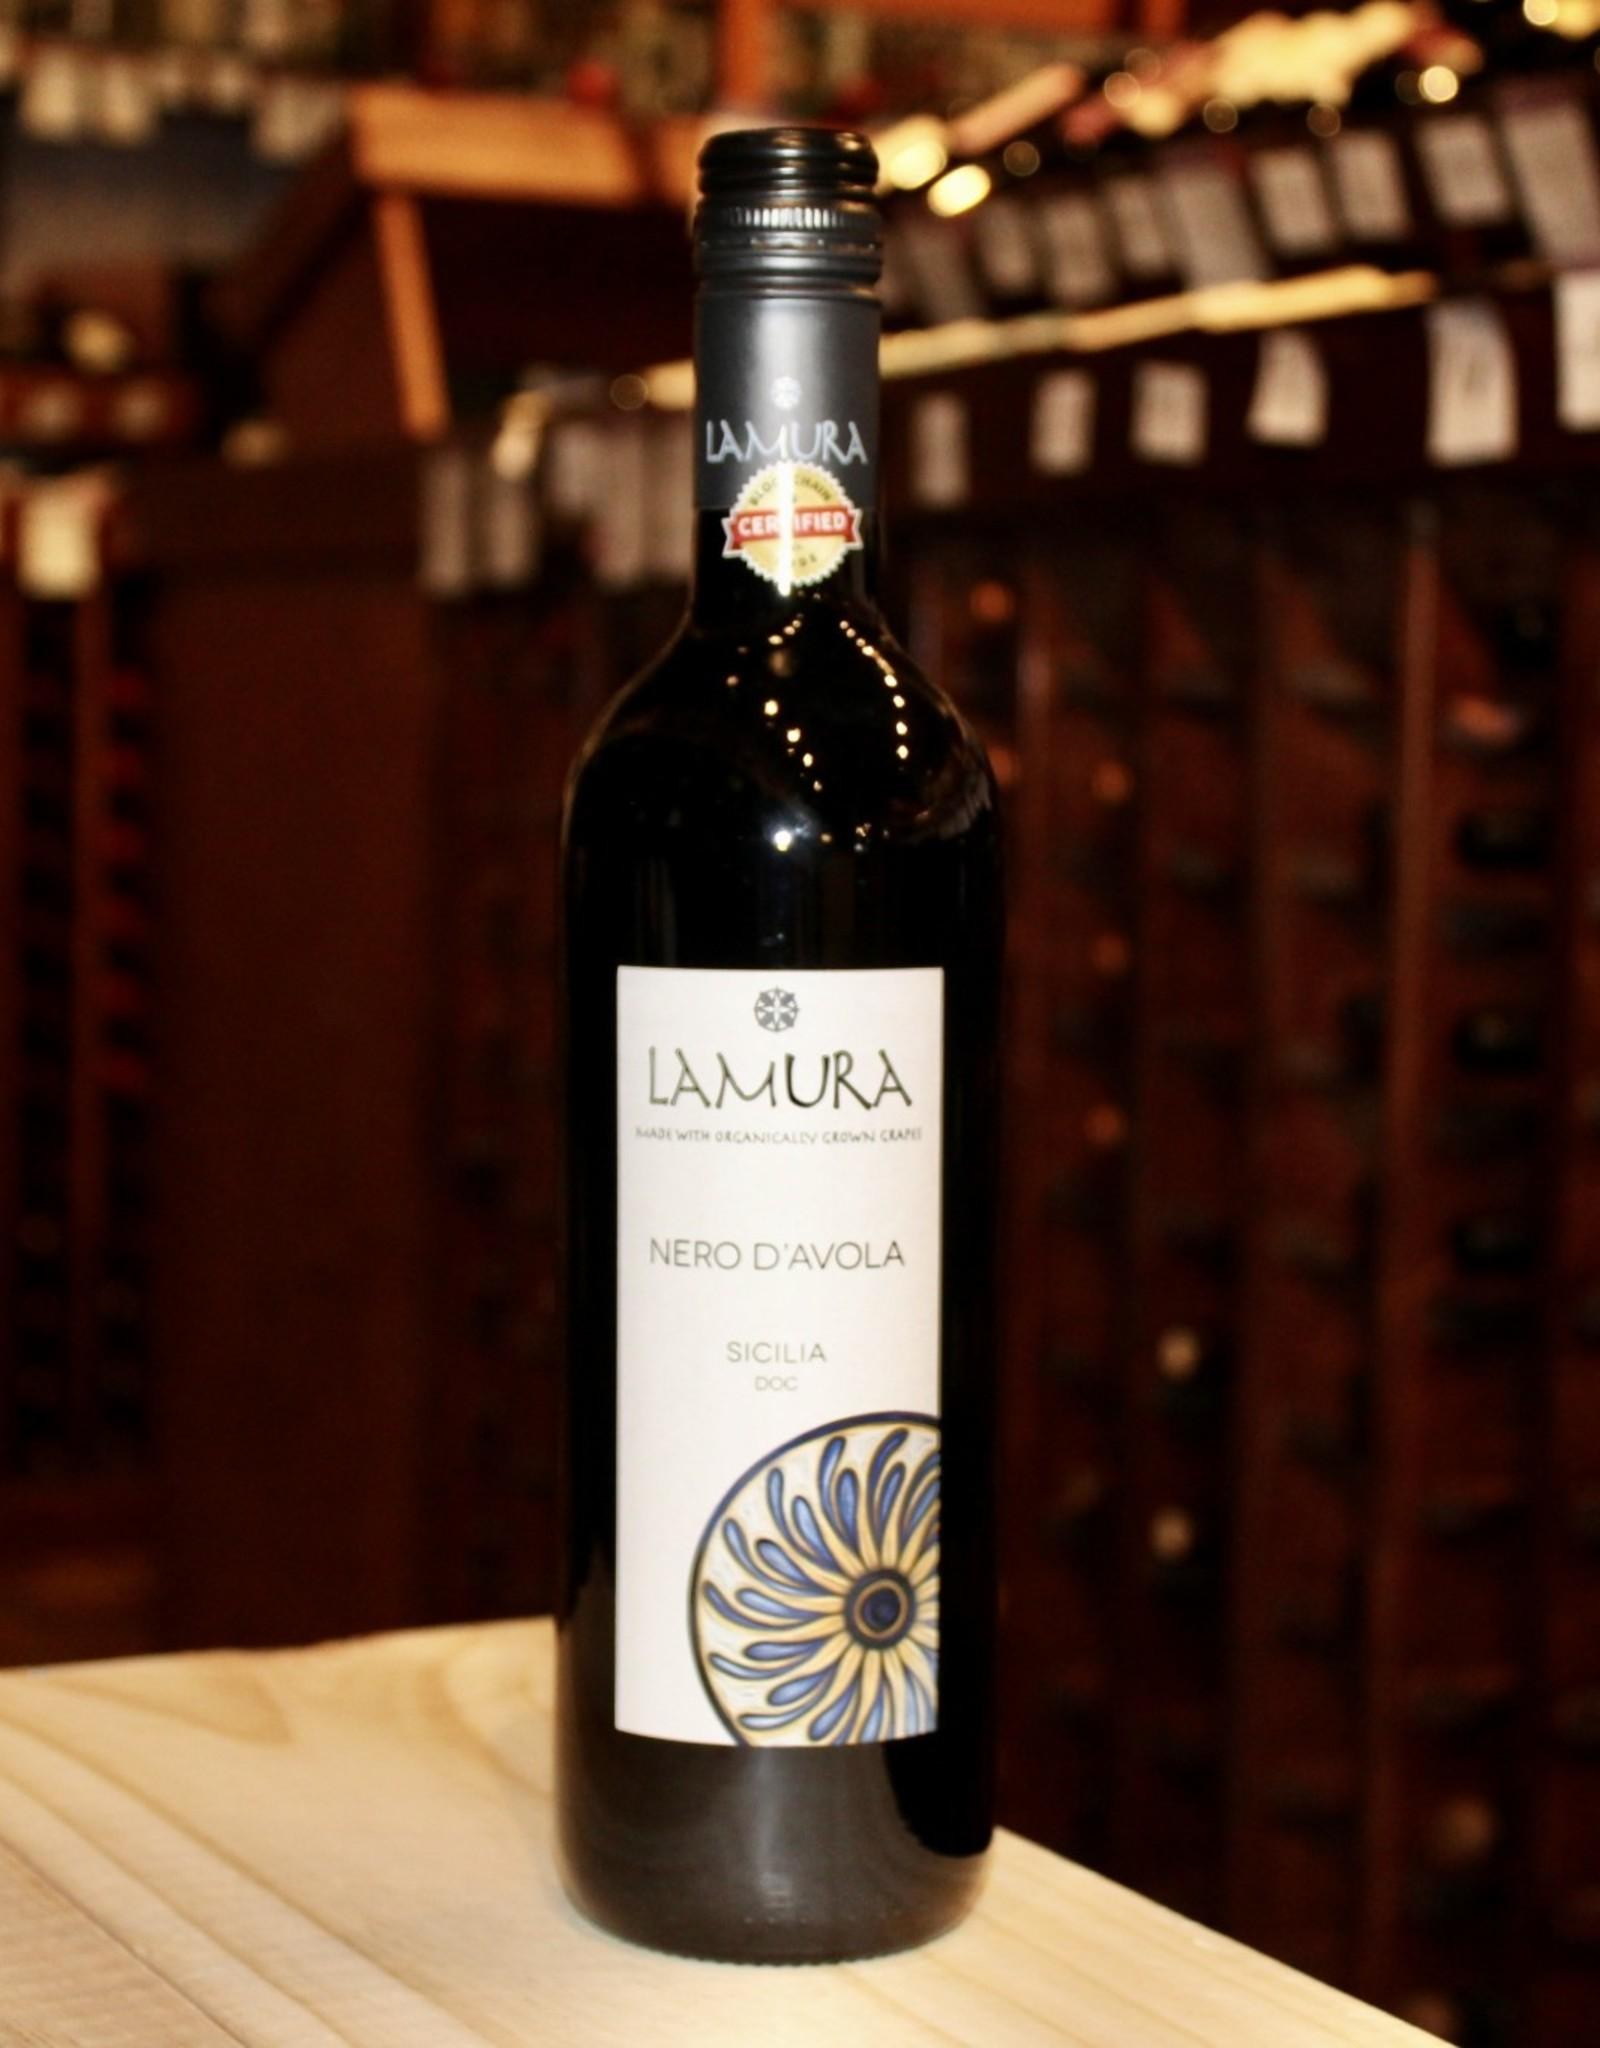 Wine Terre Siciliane Nero d'Avola - Sici2019 LaMura ly, Italy (750ml)